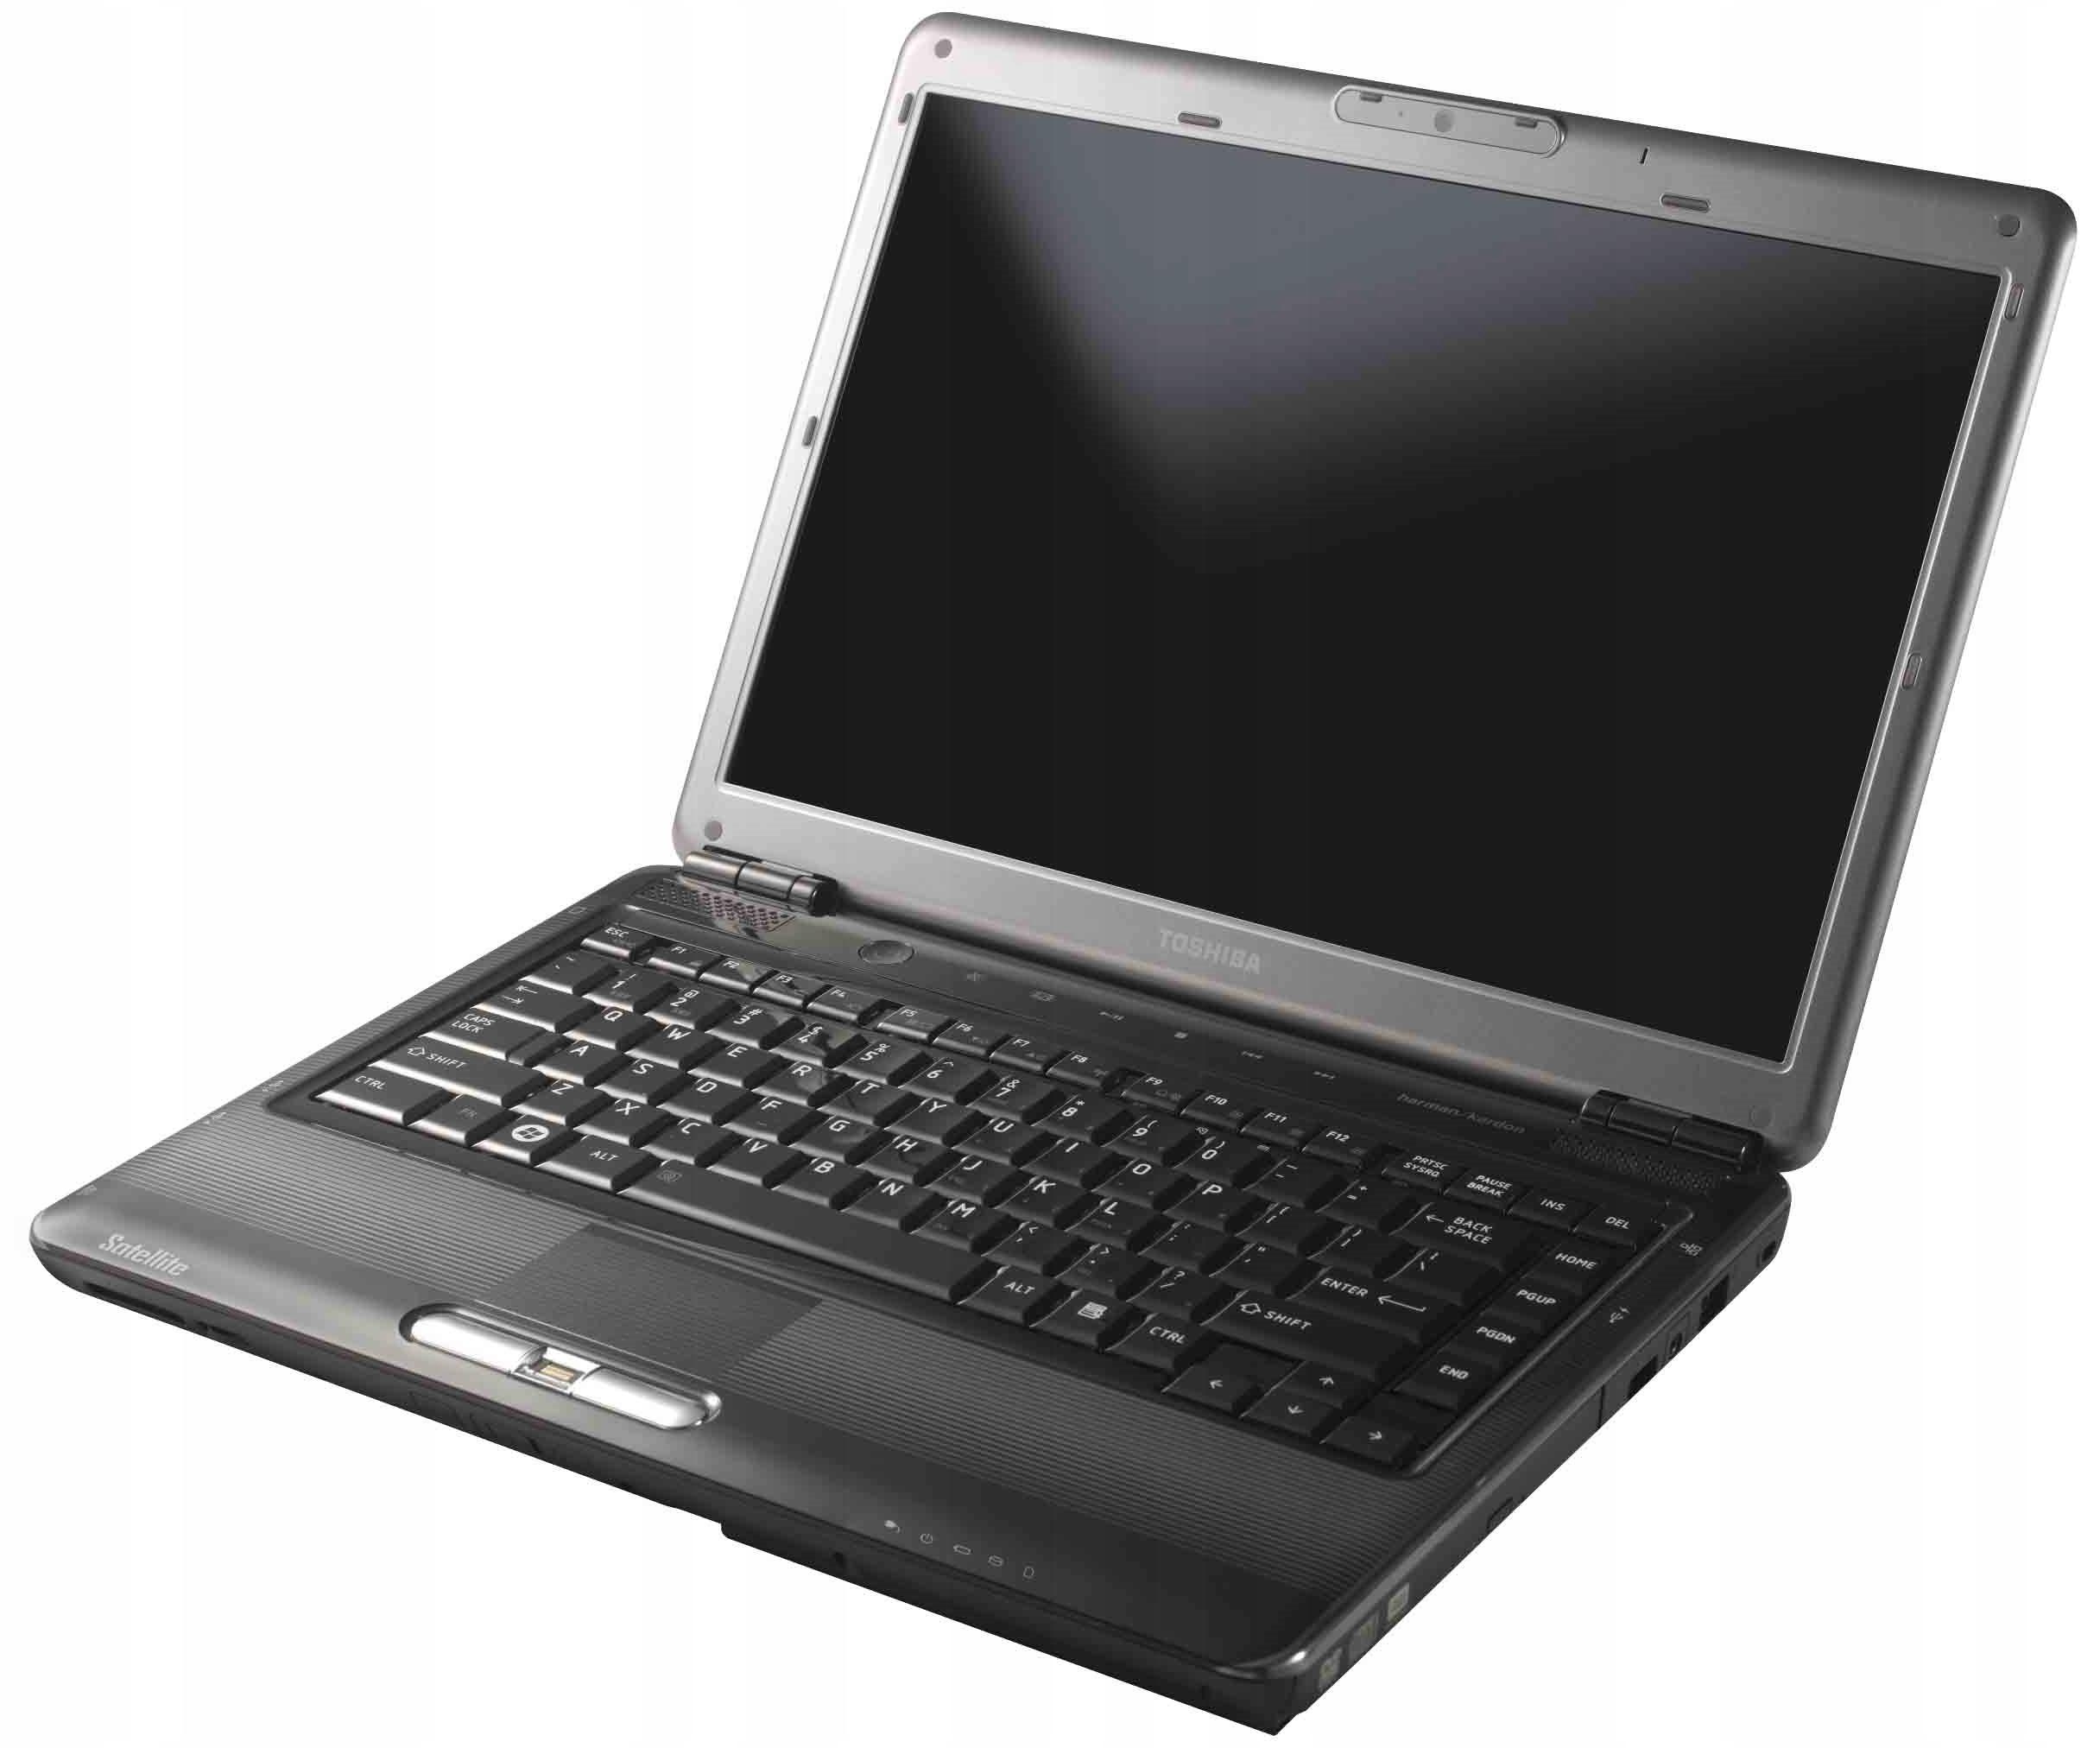 BATERIA AKUMULATOR TOSHIBA SATELLITE C650 C660D PA3817U-1BRS - Baterie do laptopów